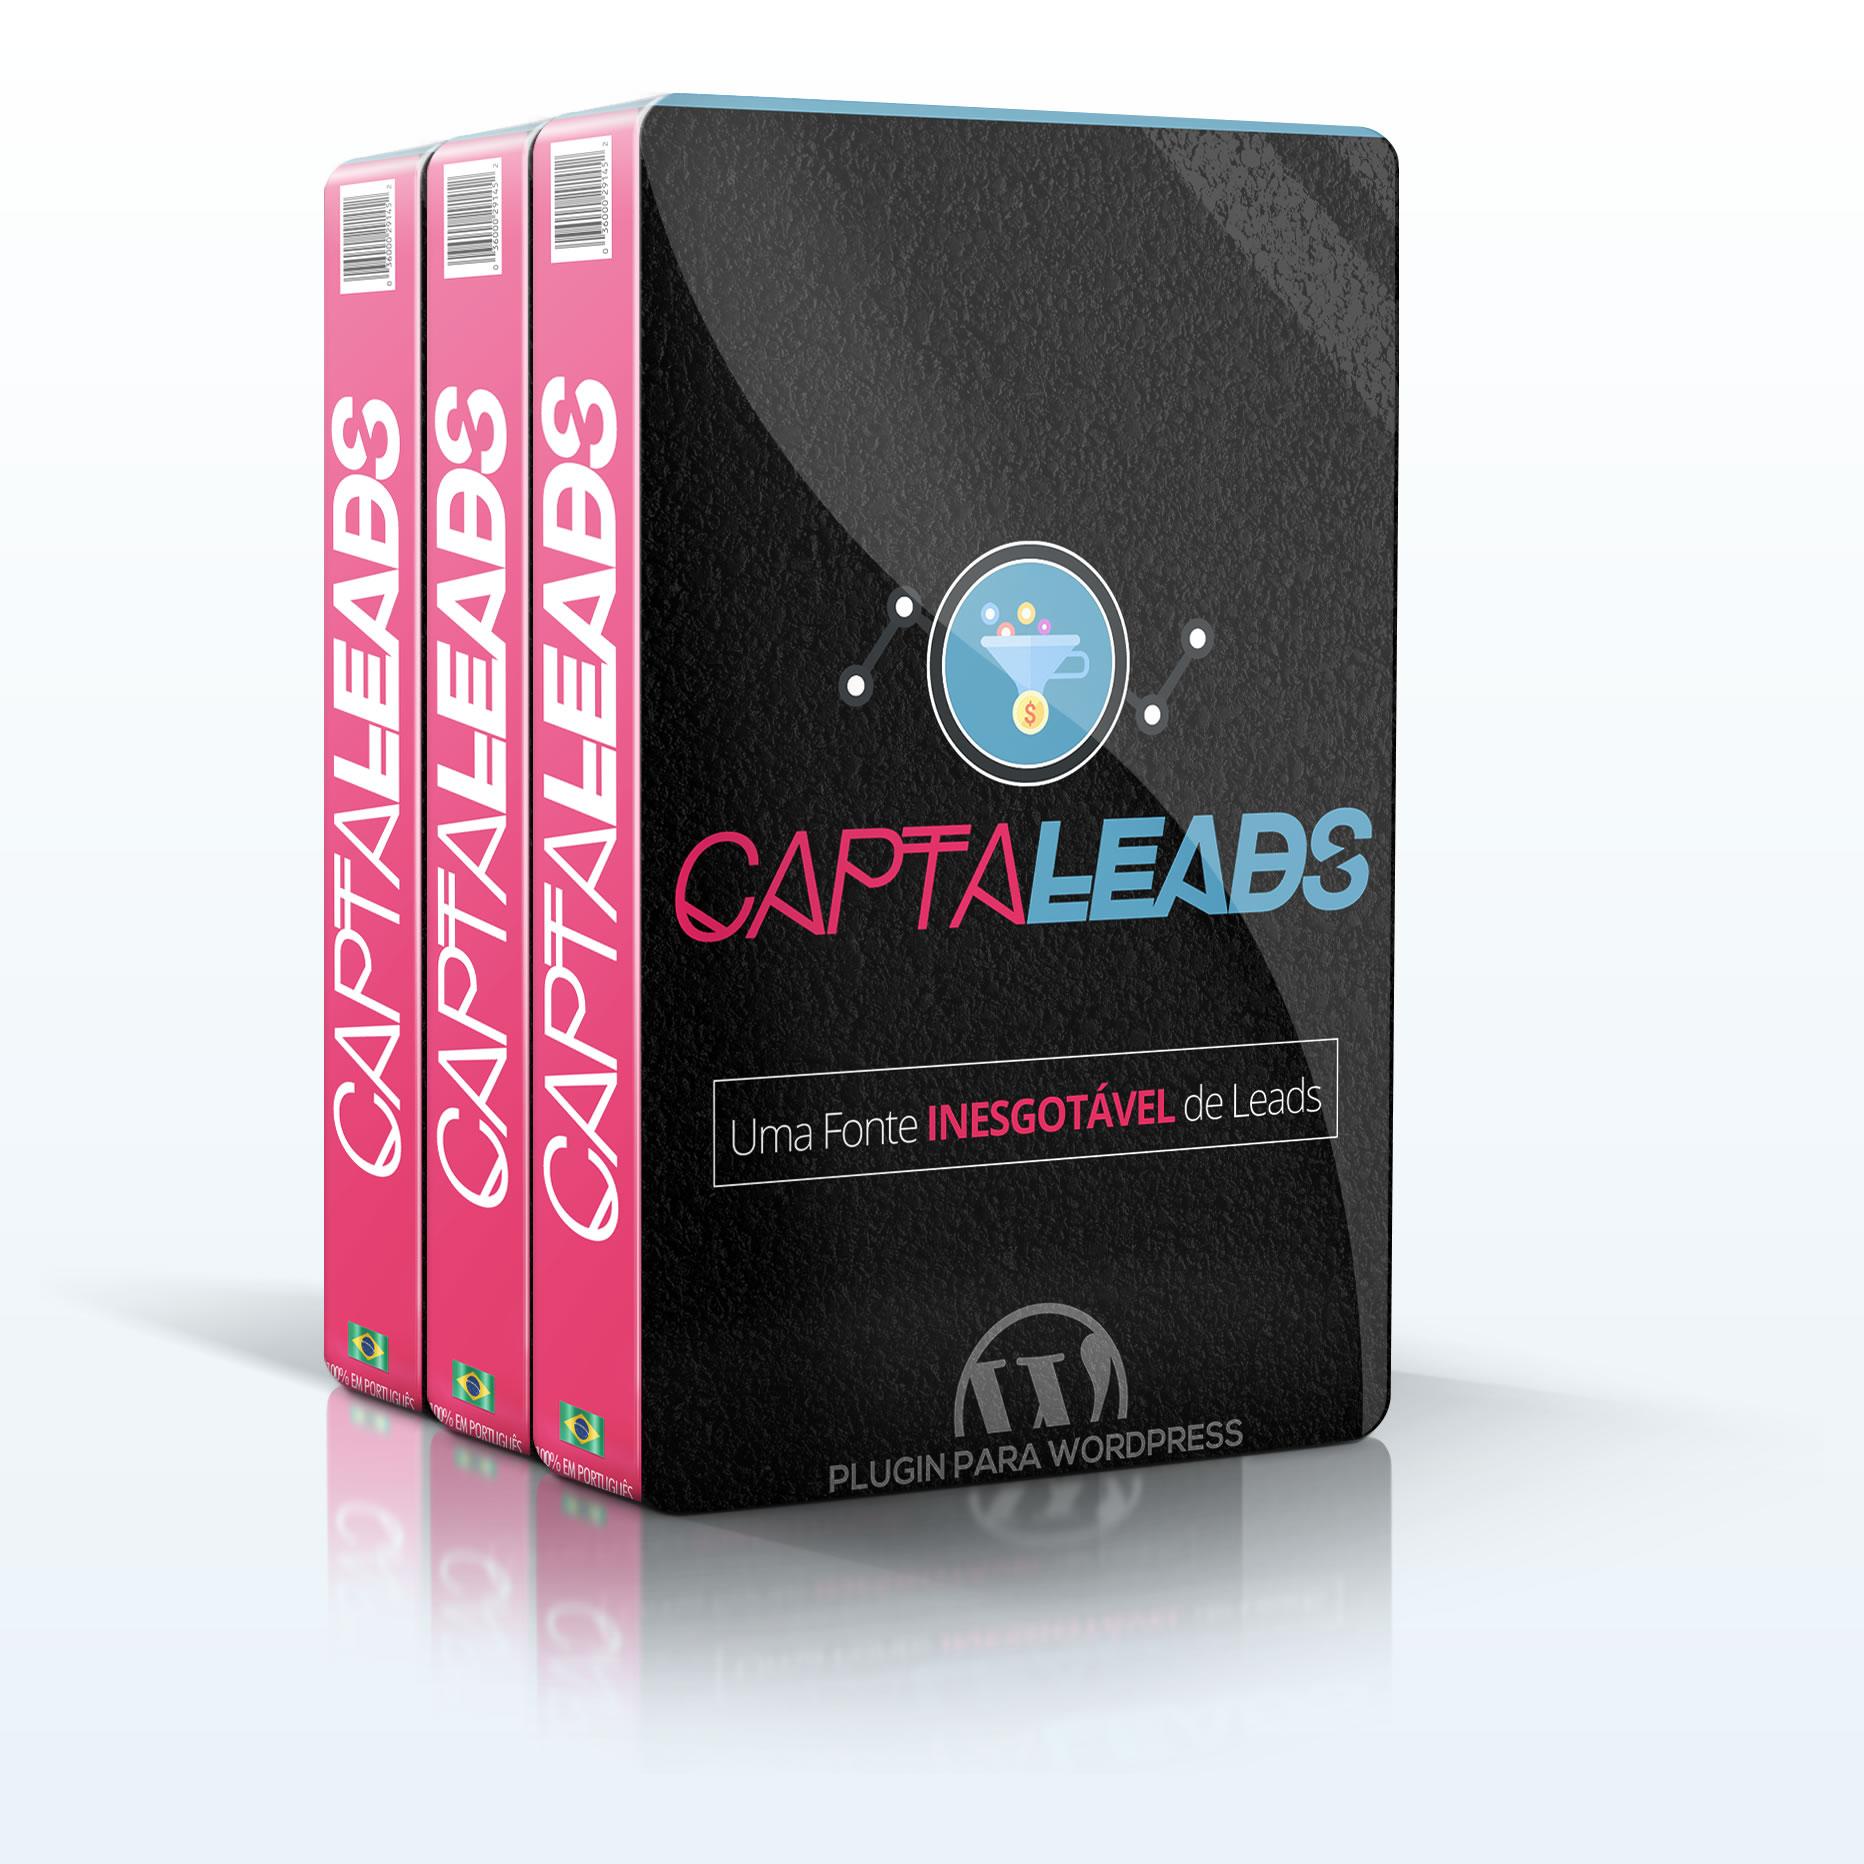 CaptaLeads/